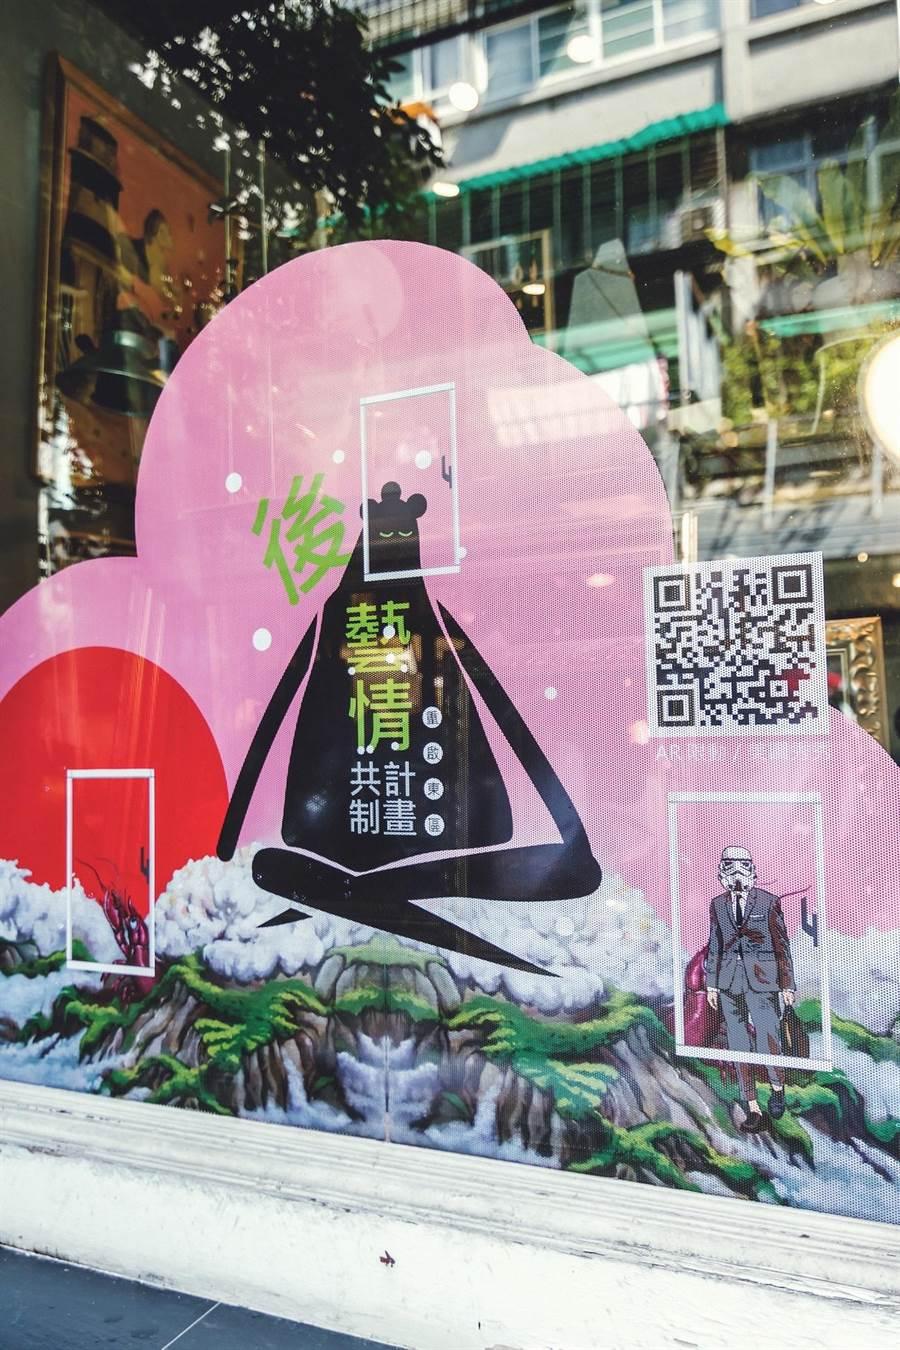 Angela X愛樂思藝術旗艦店 X 錦鋐氣密窗,台北市大安區敦化南路一段 160 巷 14 號。(JUKSY提供)